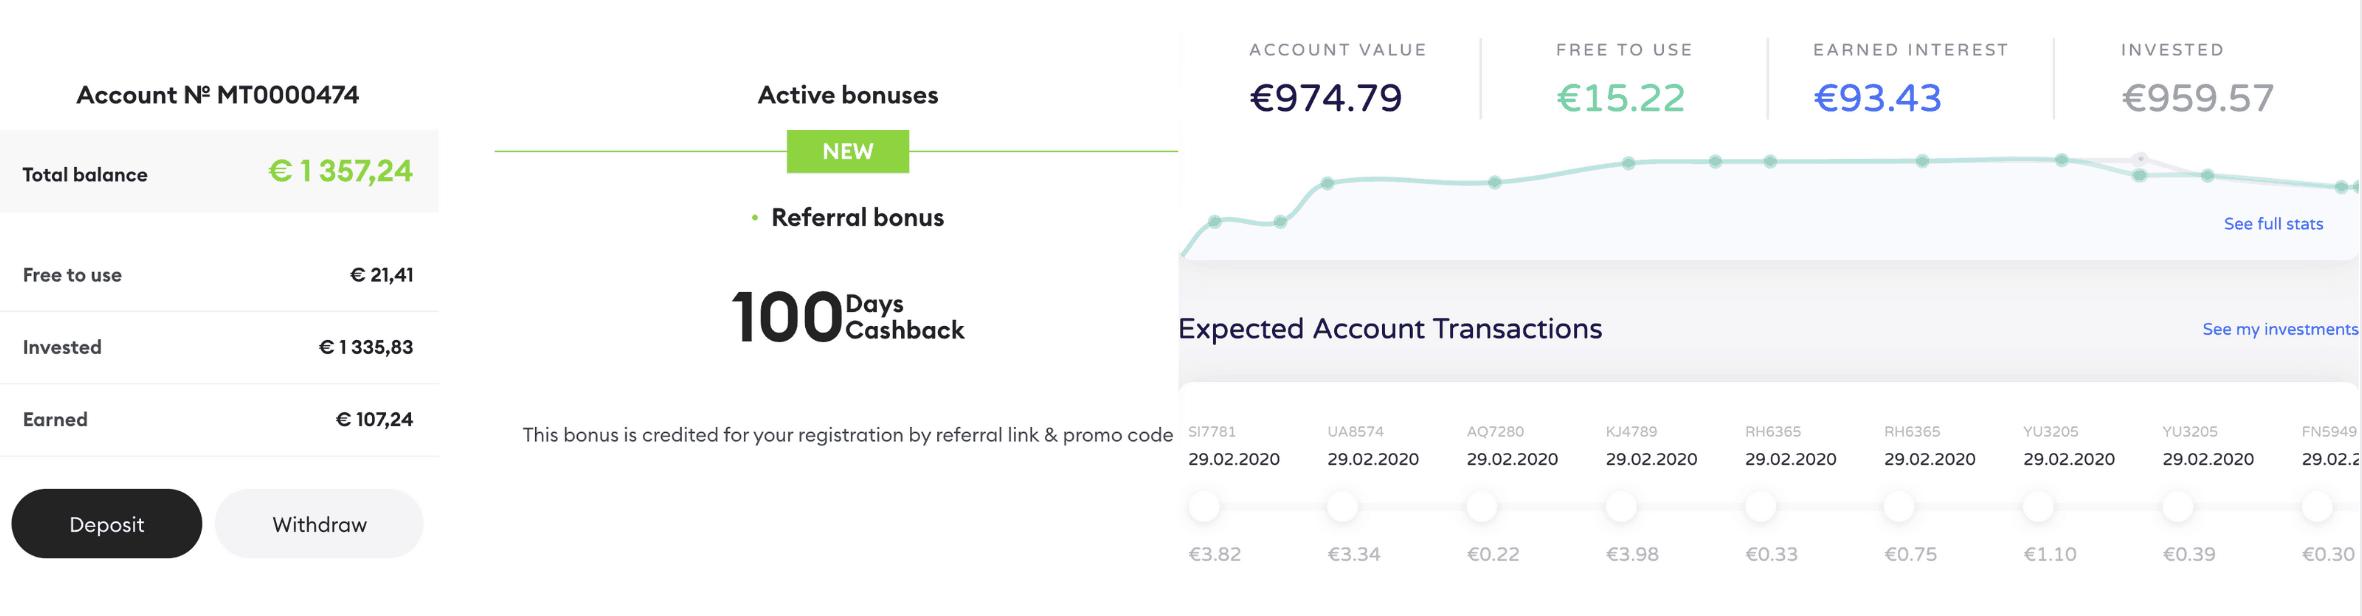 monethera and wisefund january 2020